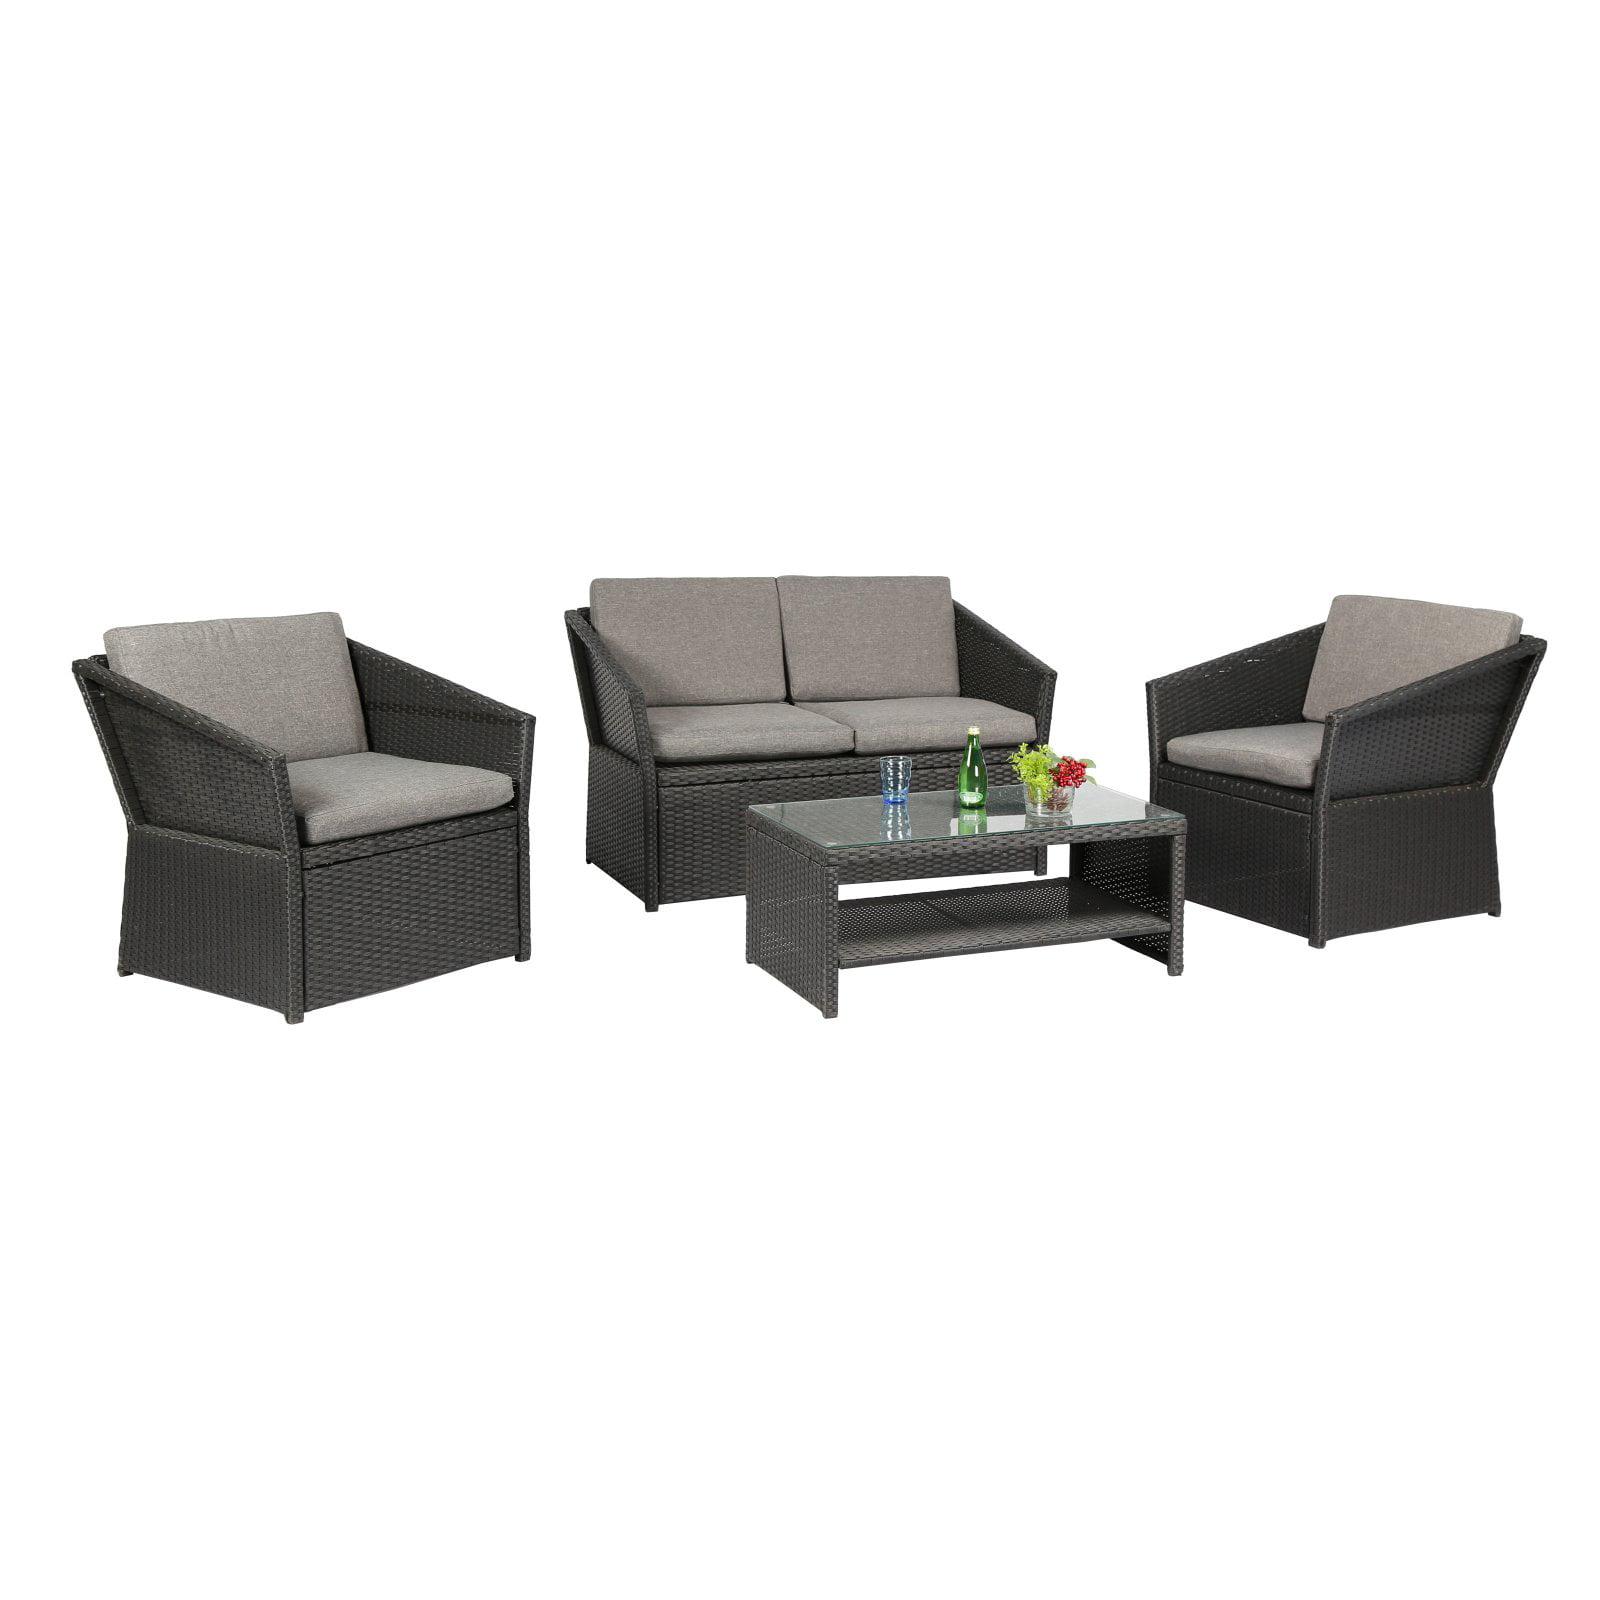 Baner Garden Outdoor Furniture Complete Patio PE Wicker Rattan Garden Set, Black, 4-Pieces by Caesar Hardware International Limited